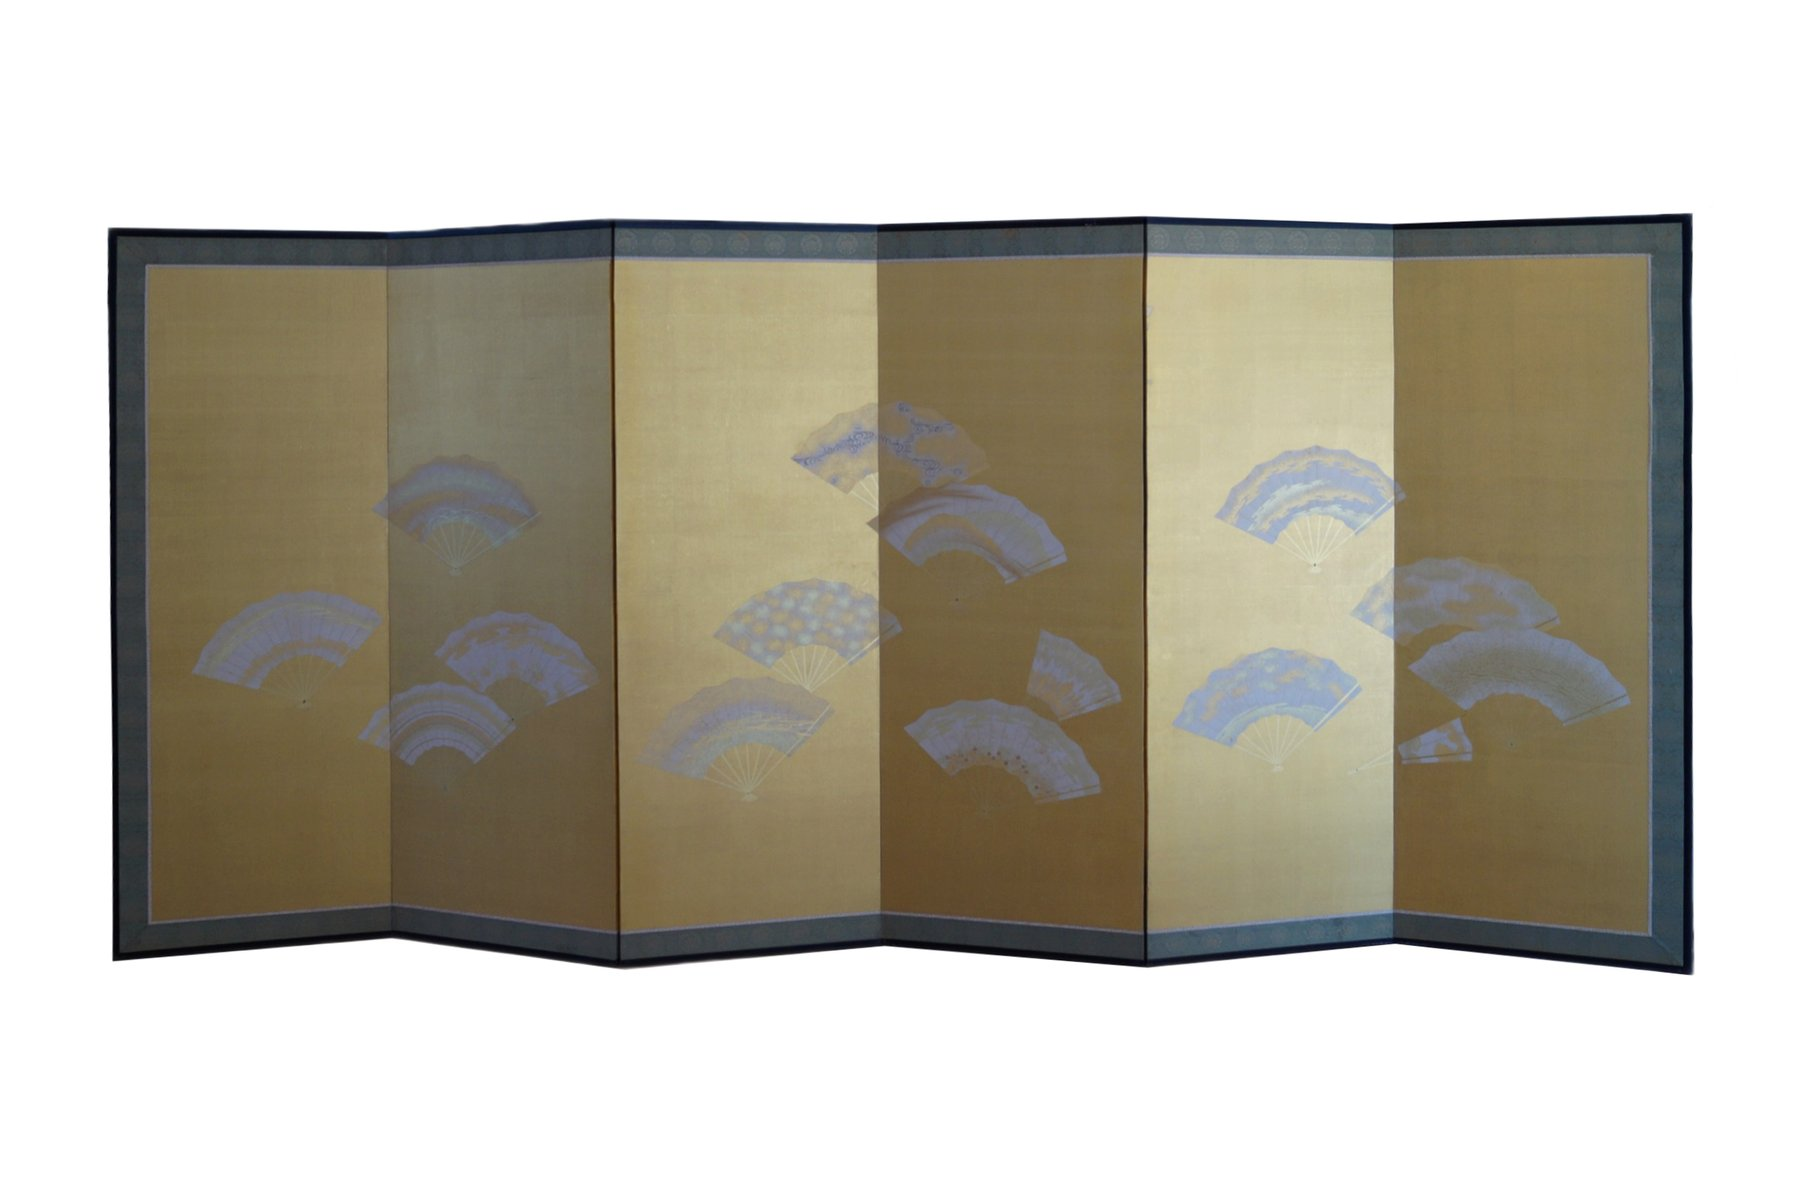 Folding Screen Meiji Showa Period Japanese Six Panel Folding Screen For Sale At